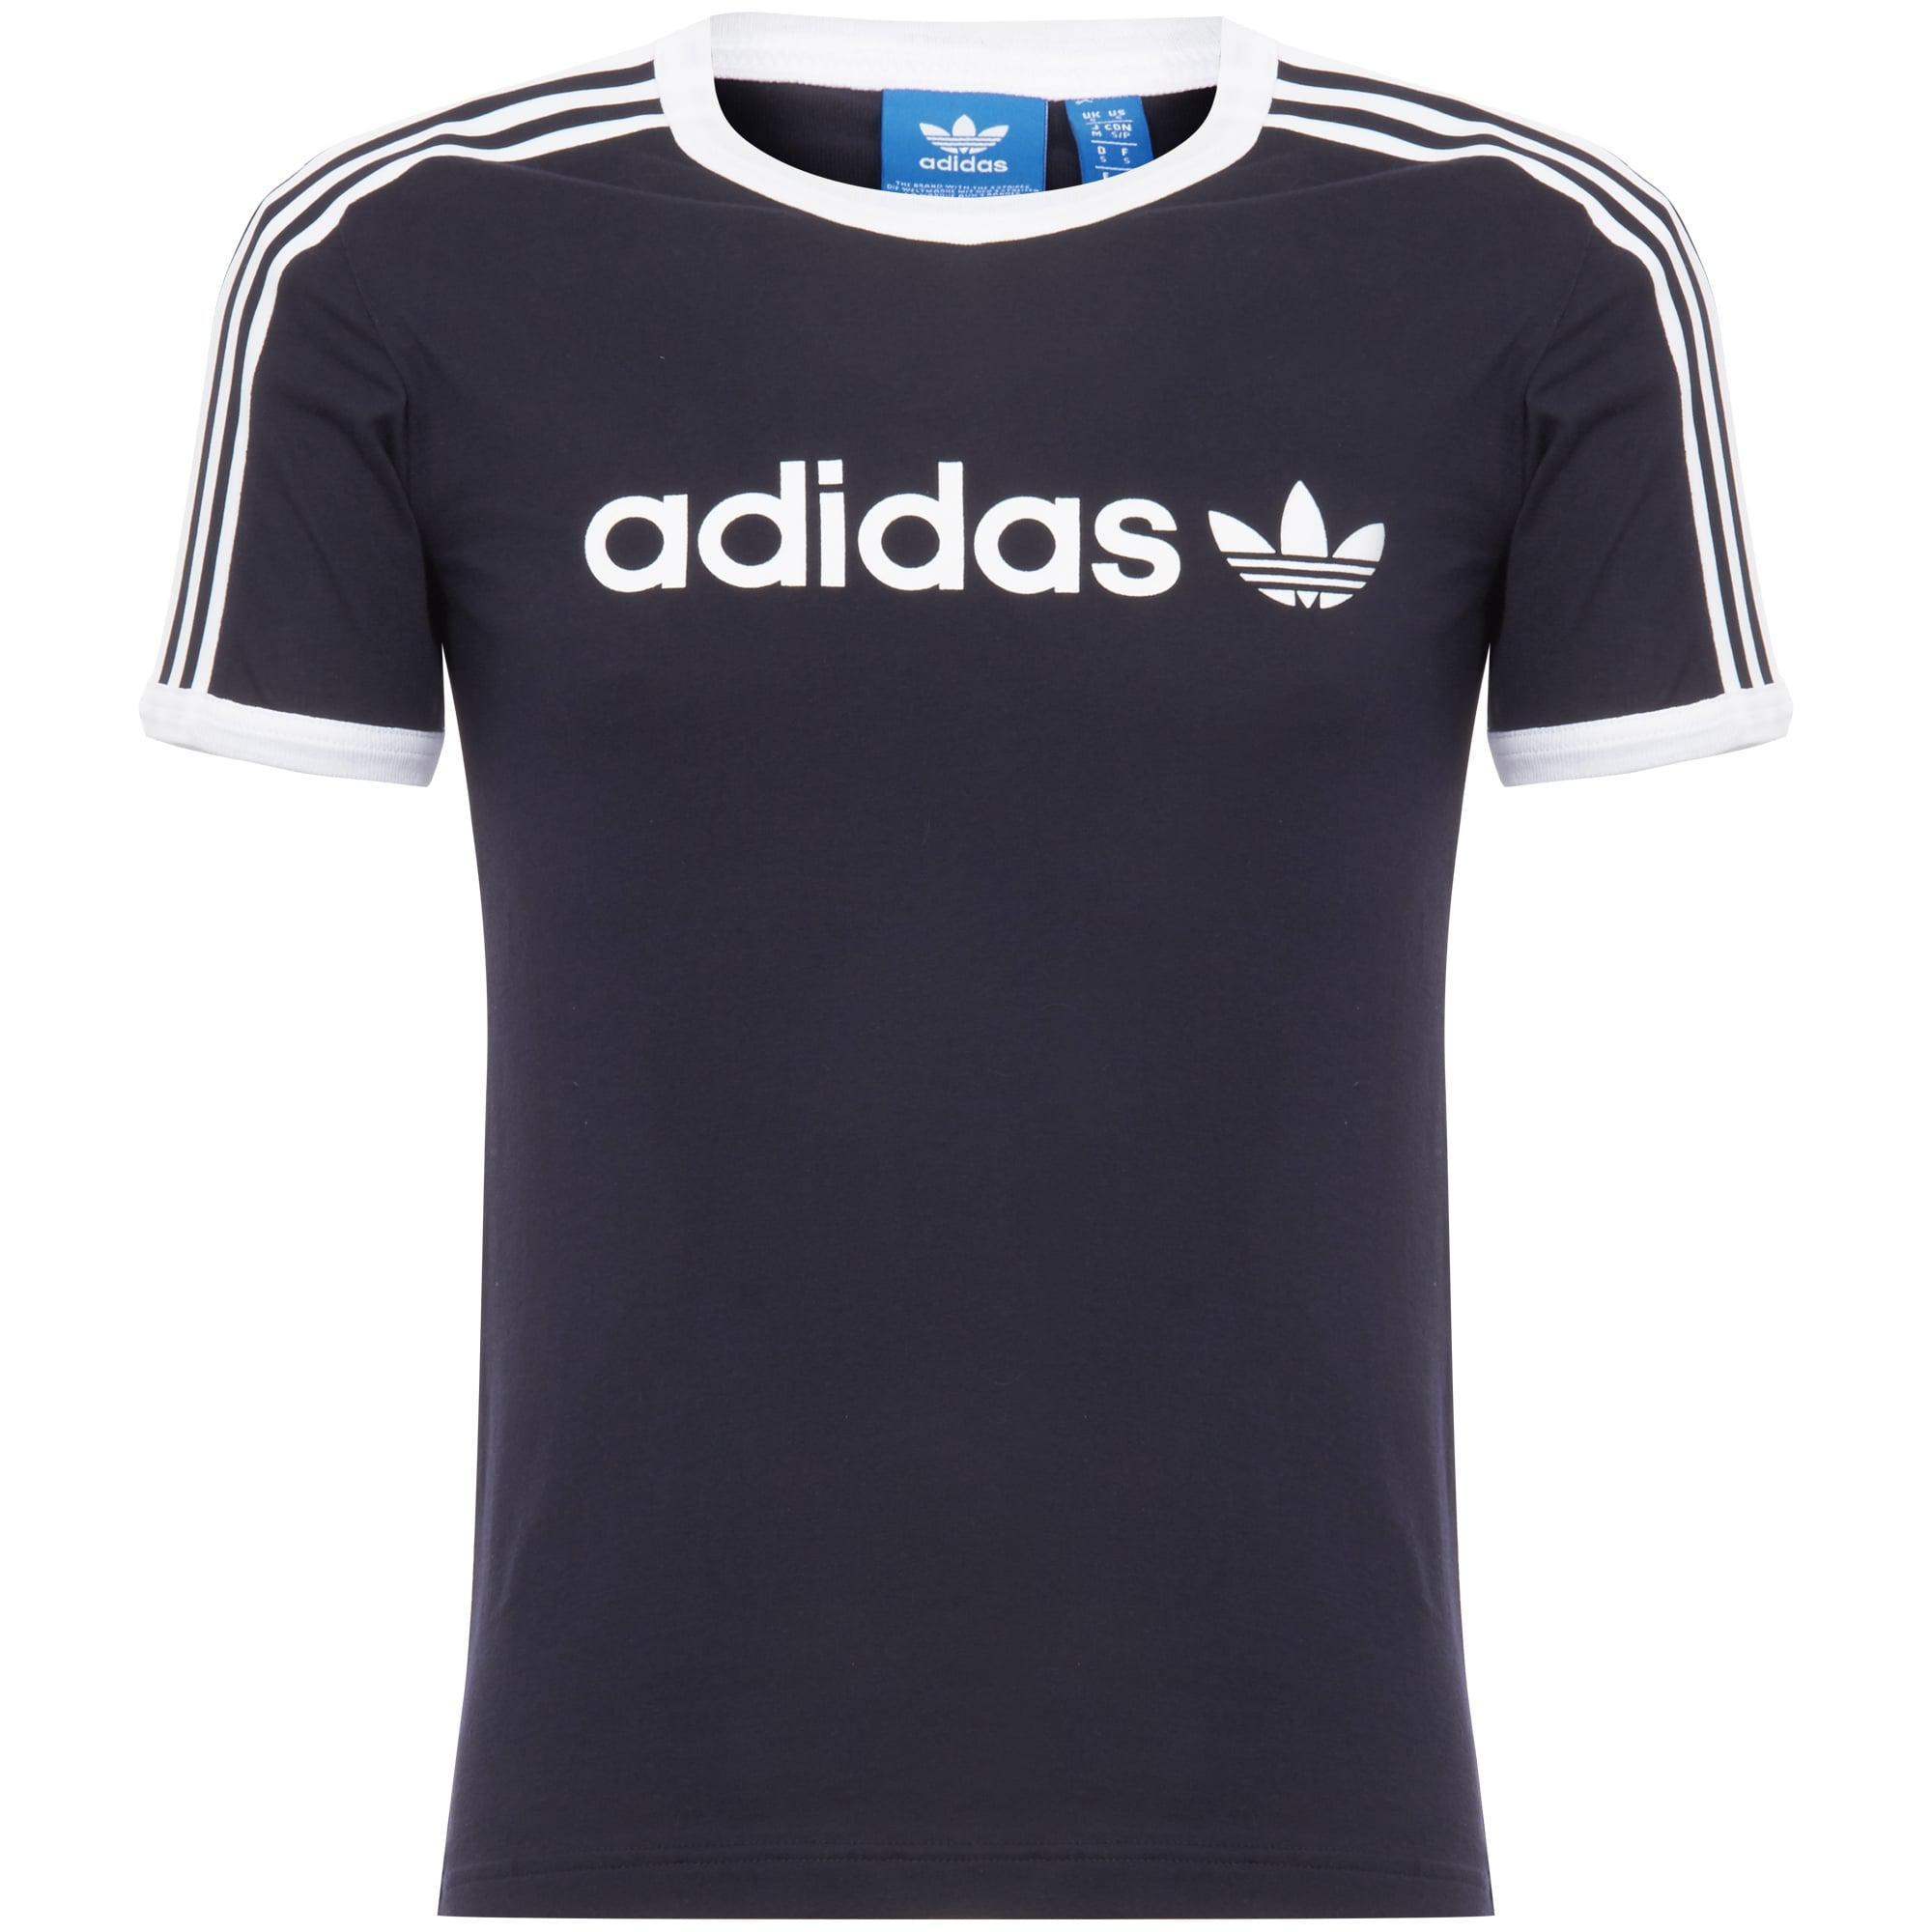 c4b3c231 adidas Originals Linear Trefoil T-shirt in Blue for Men - Save 56 ...